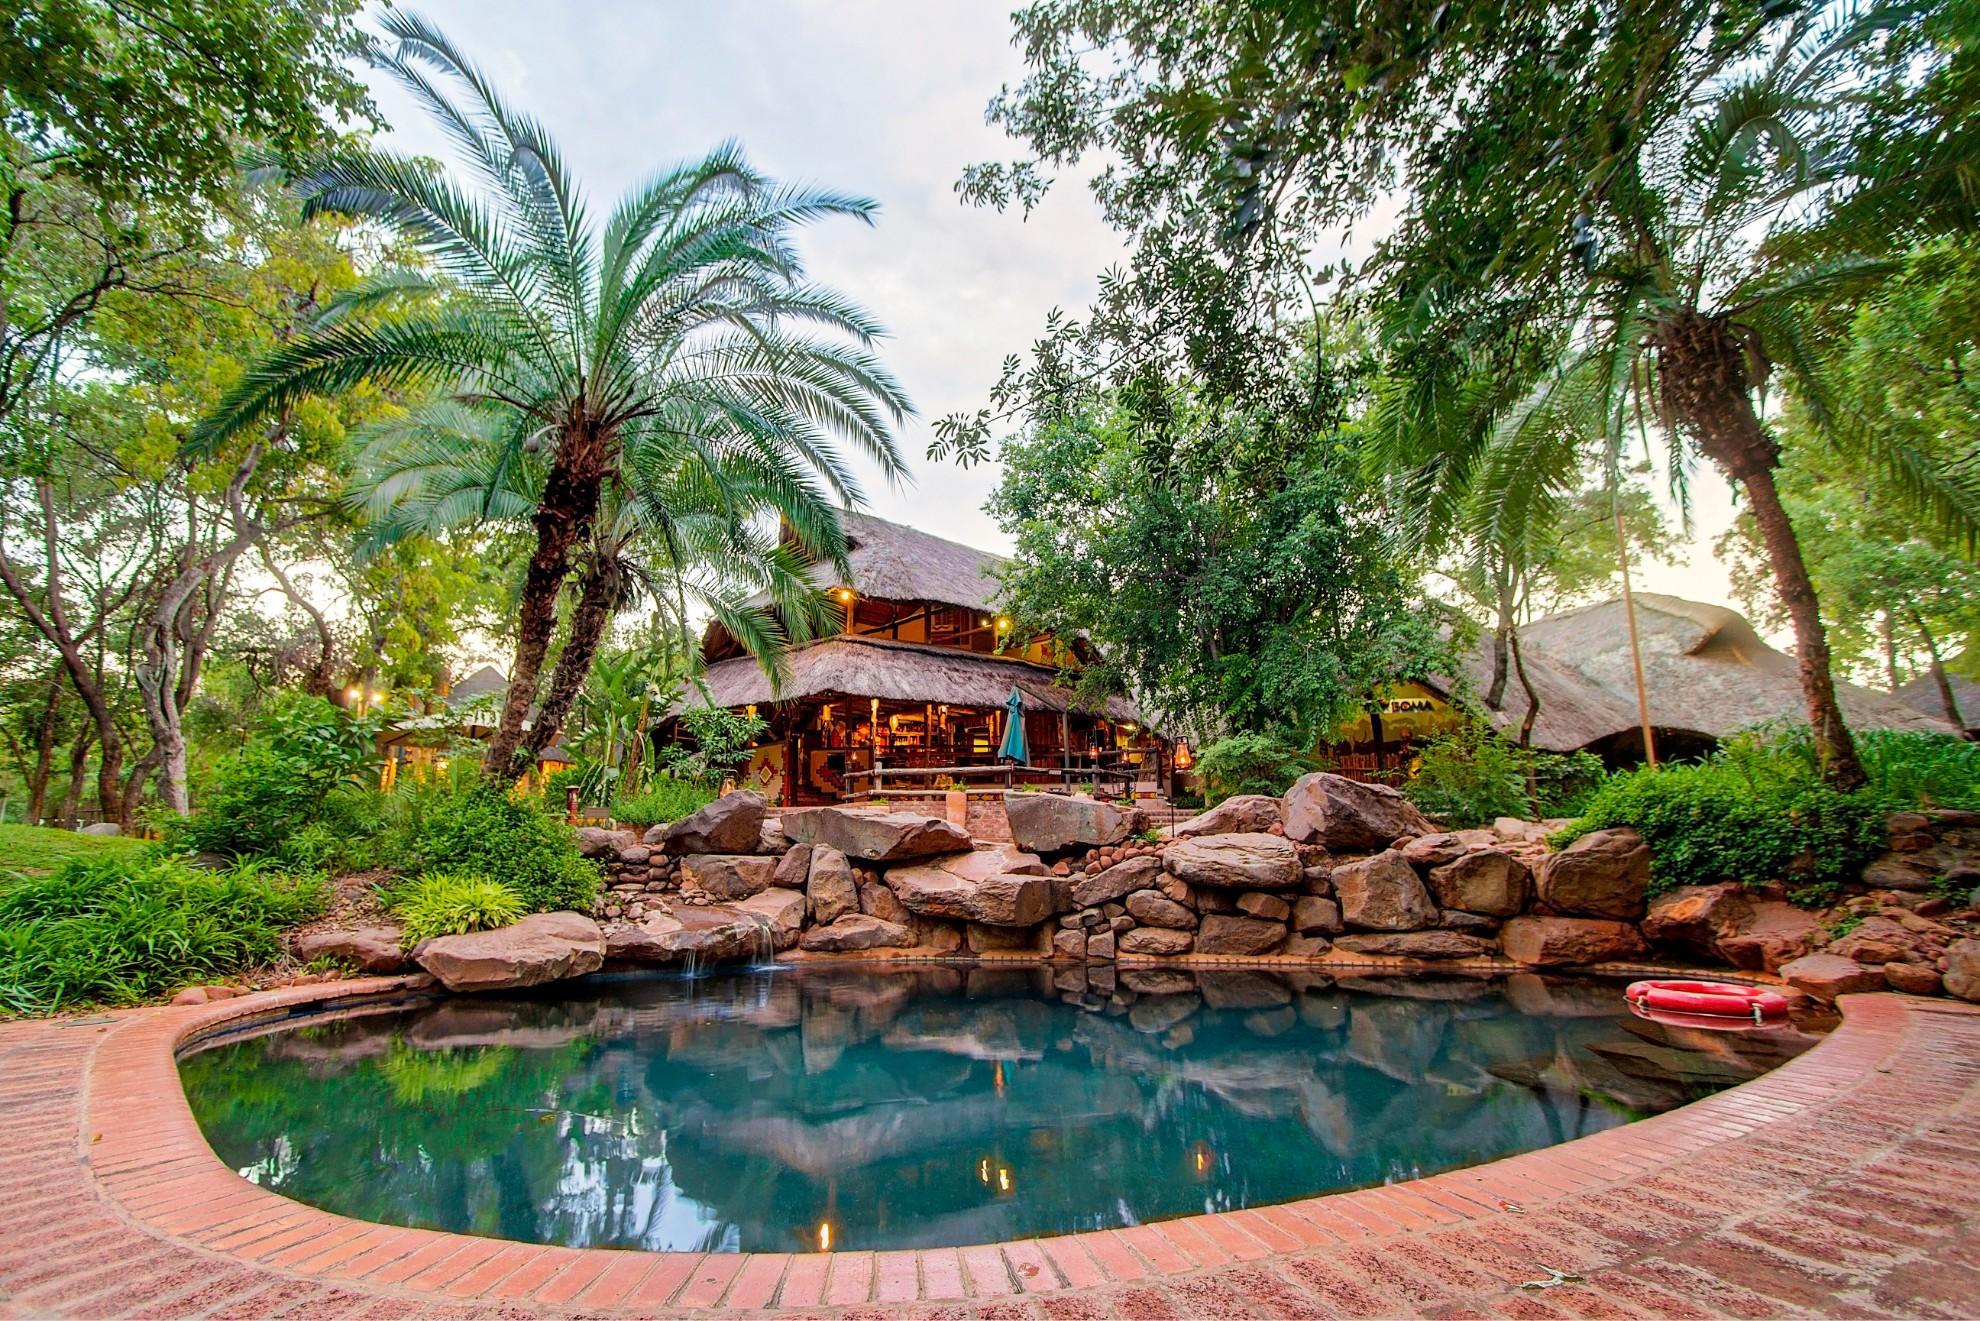 Lokuthula Lodges Victoria Falls Zimbabwe Pool_at_the_boma